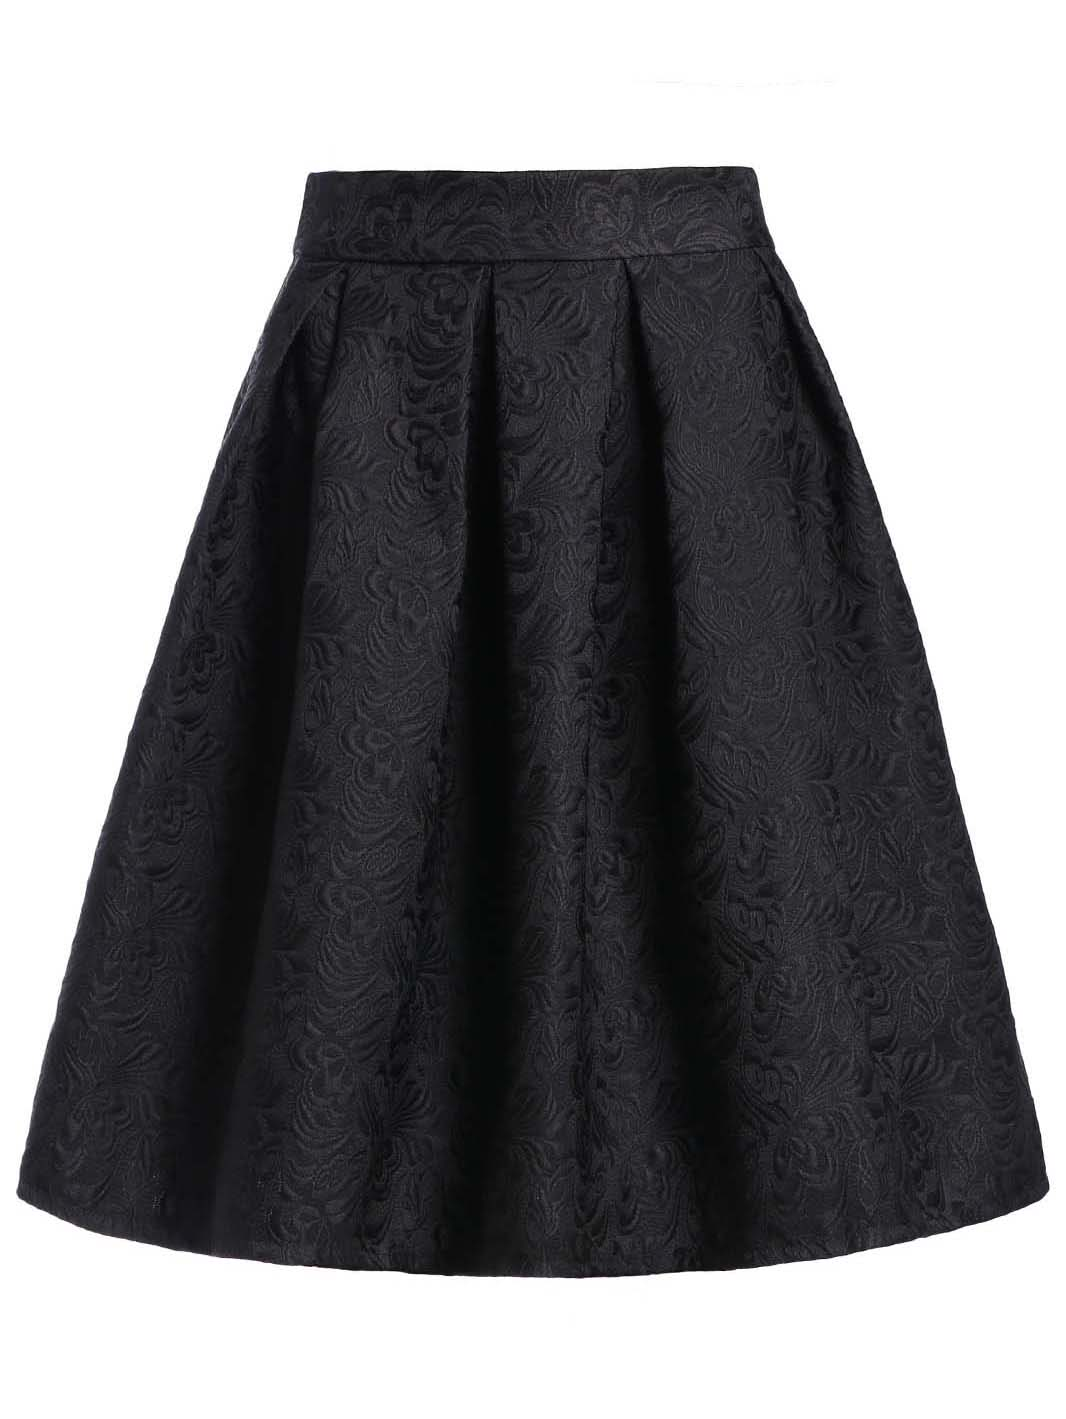 Jacquard Box Pleated Skirt